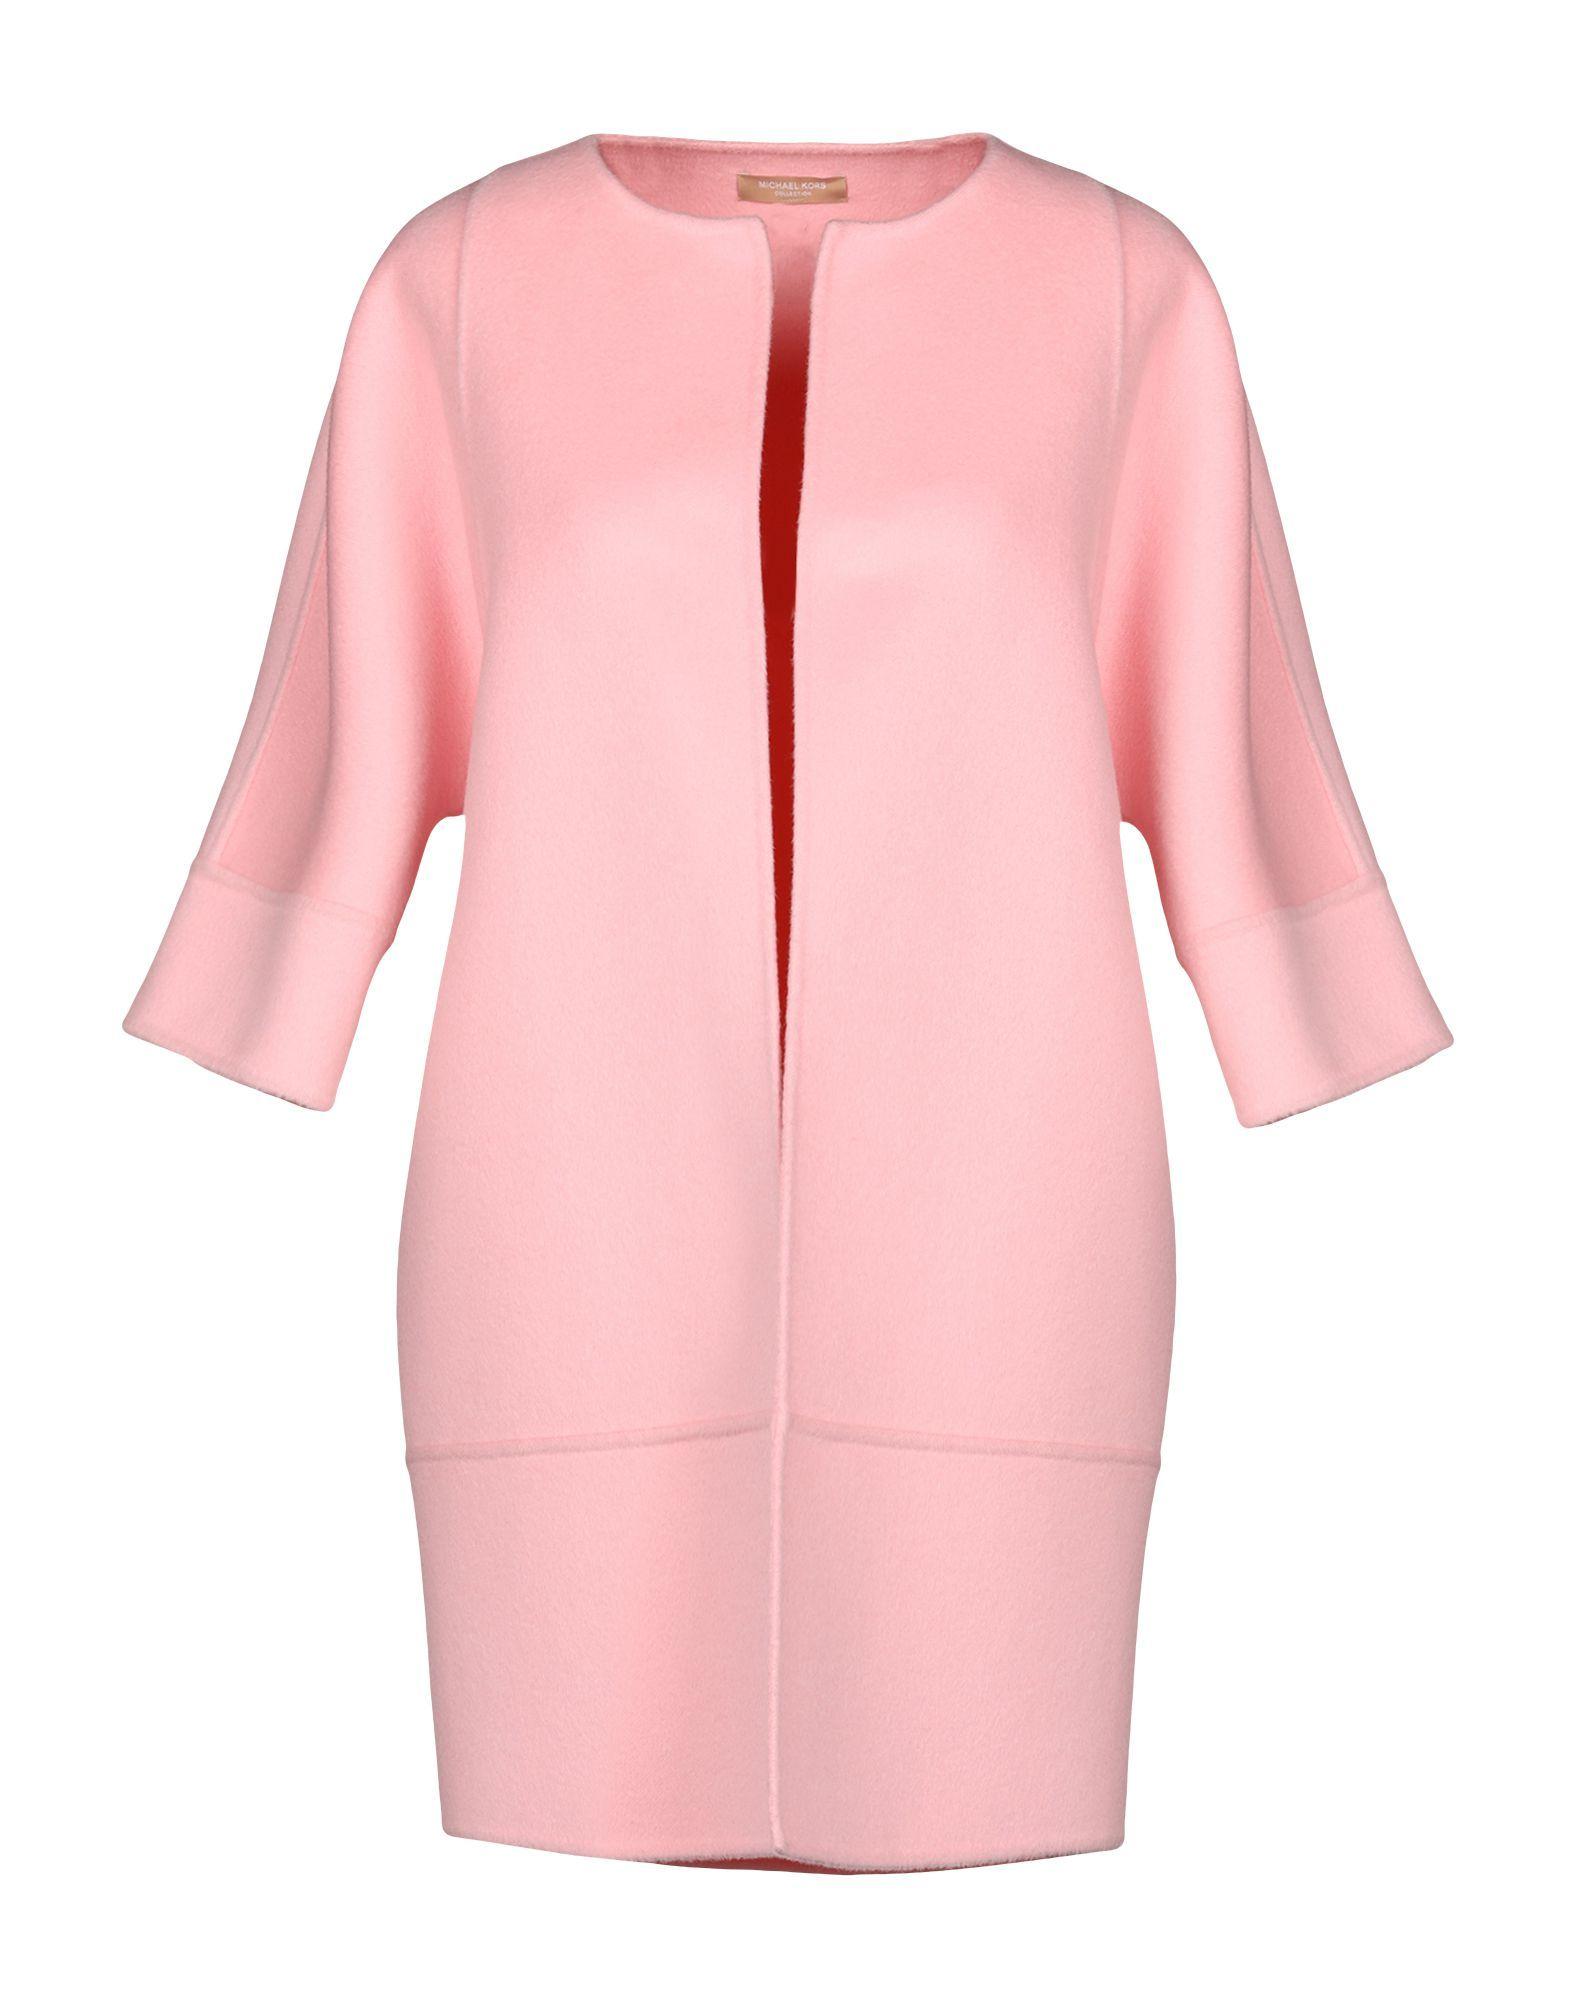 COATS & JACKETS Michael Kors Collection Pink Woman Virgin Wool